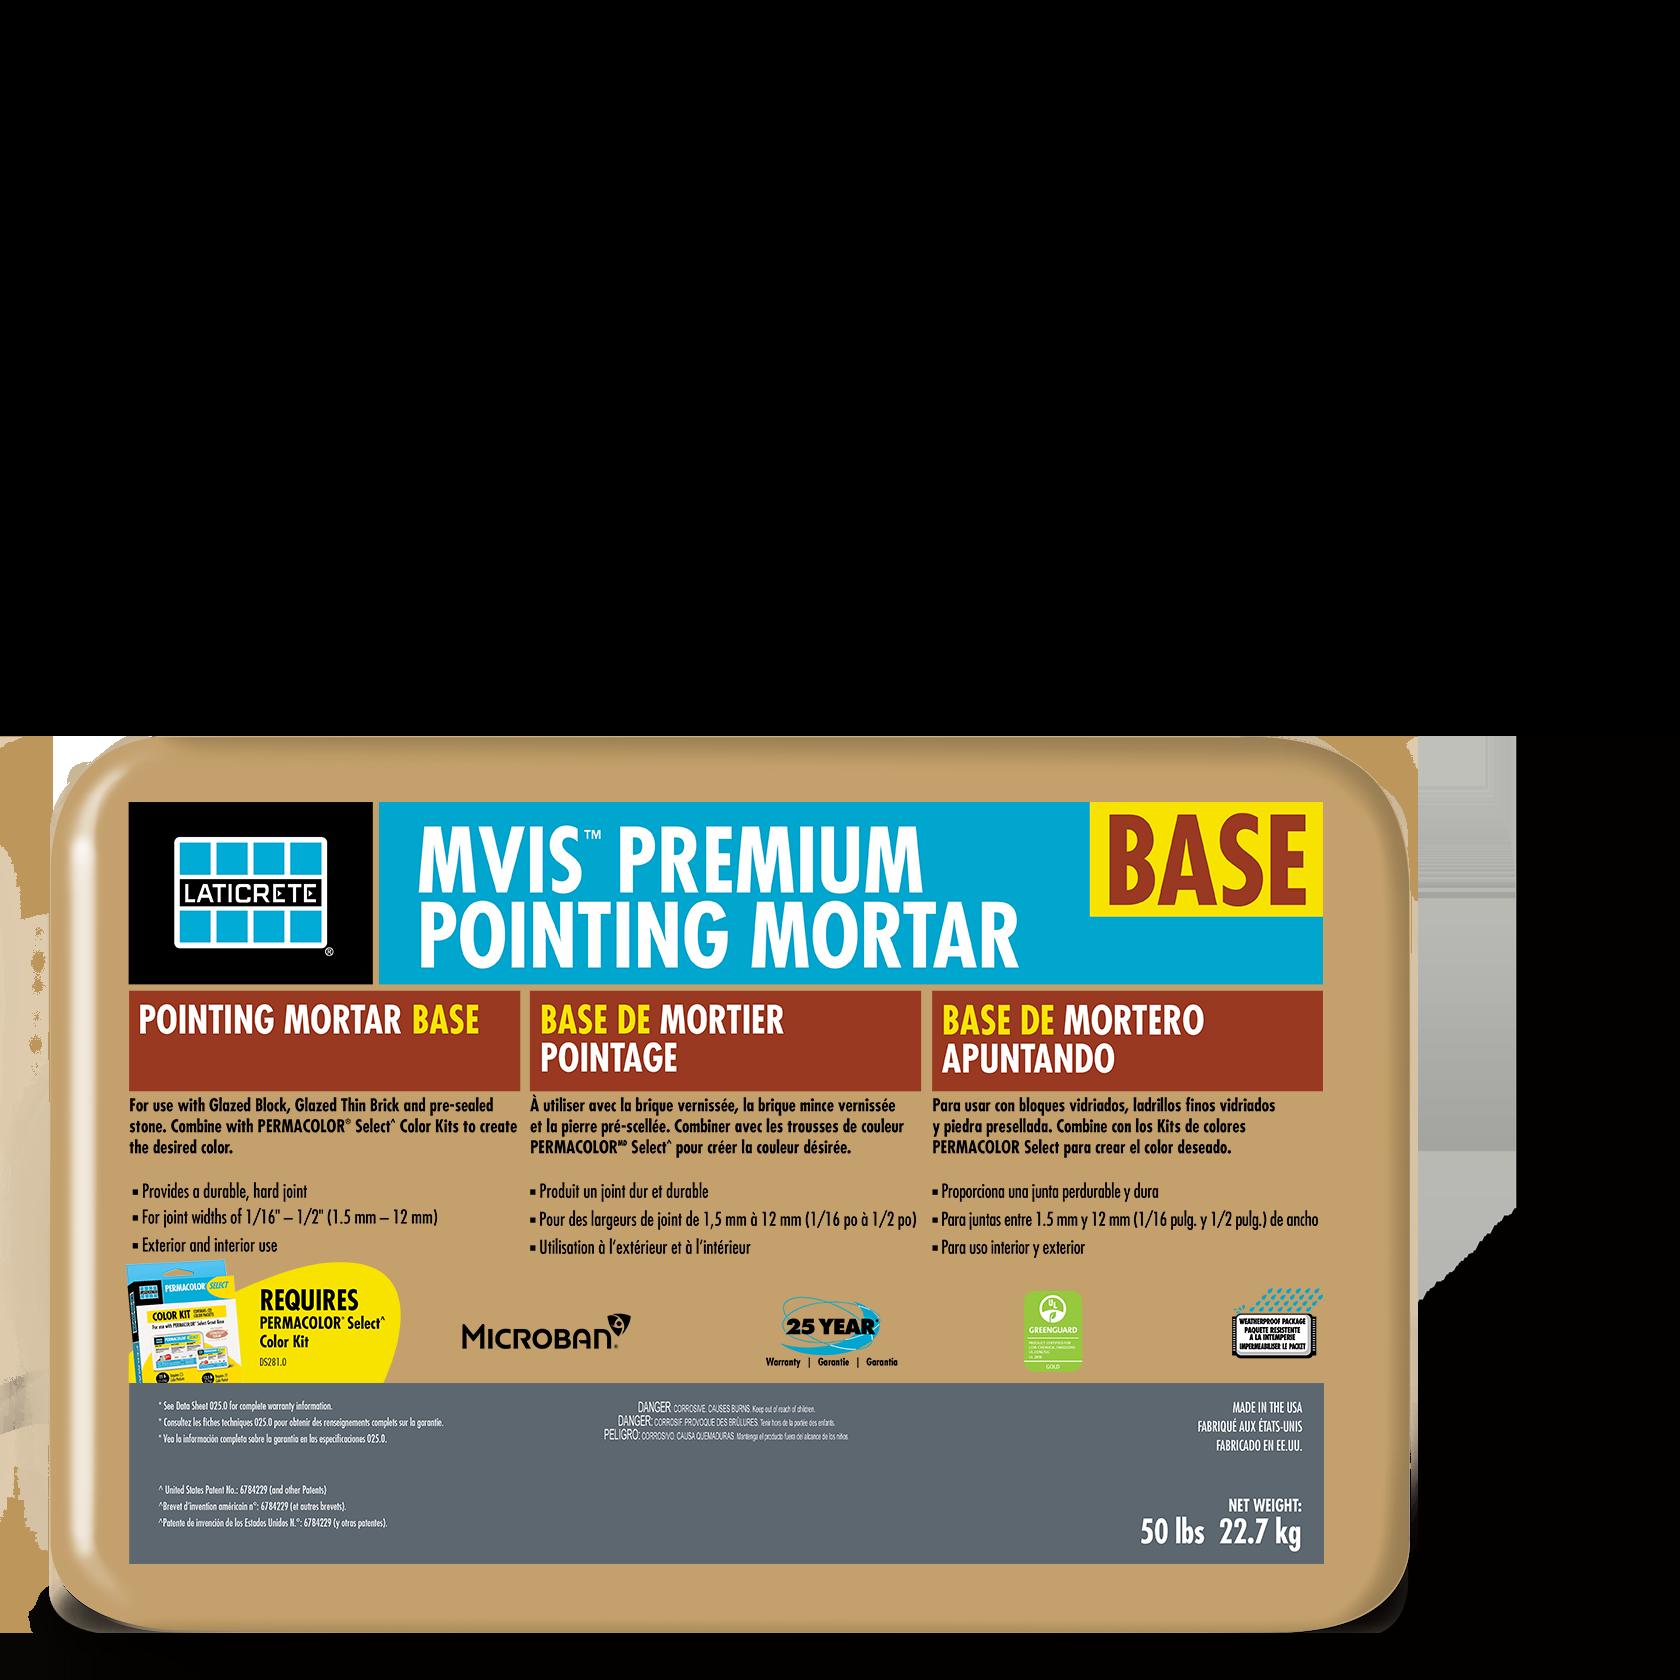 MVIS™ Premium Pointing Mortar